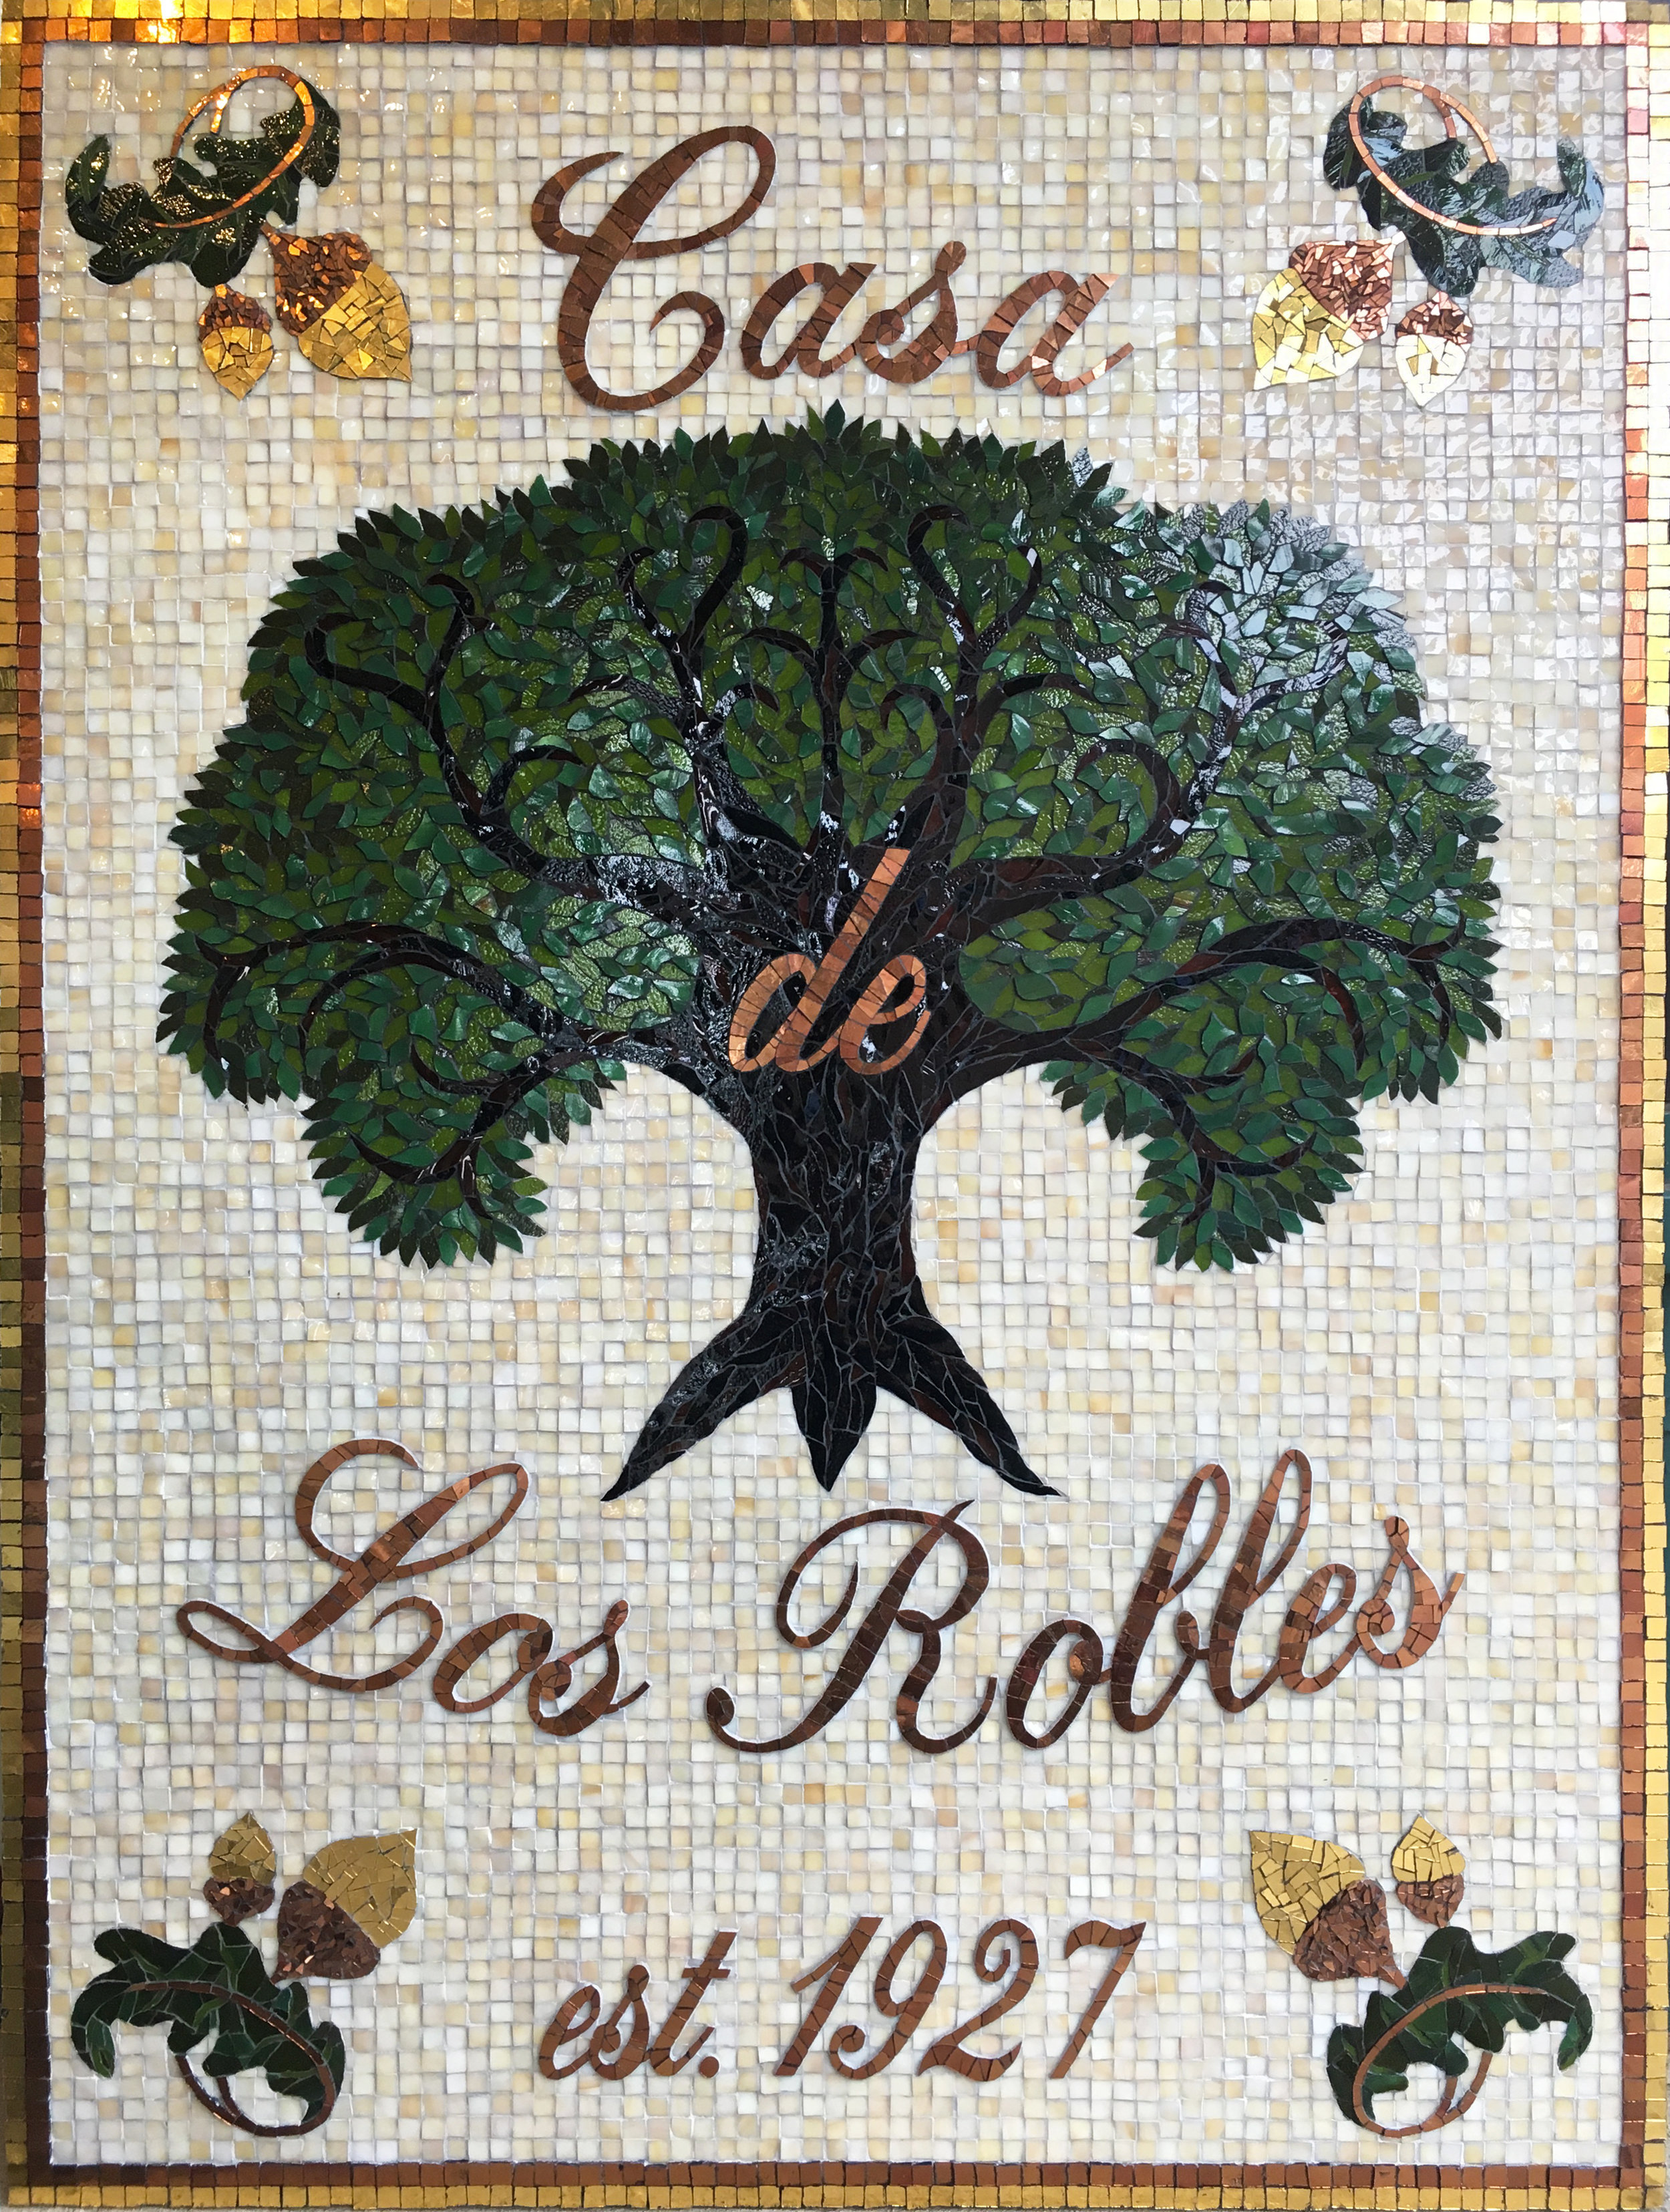 Casa de Los Robles Mosaic